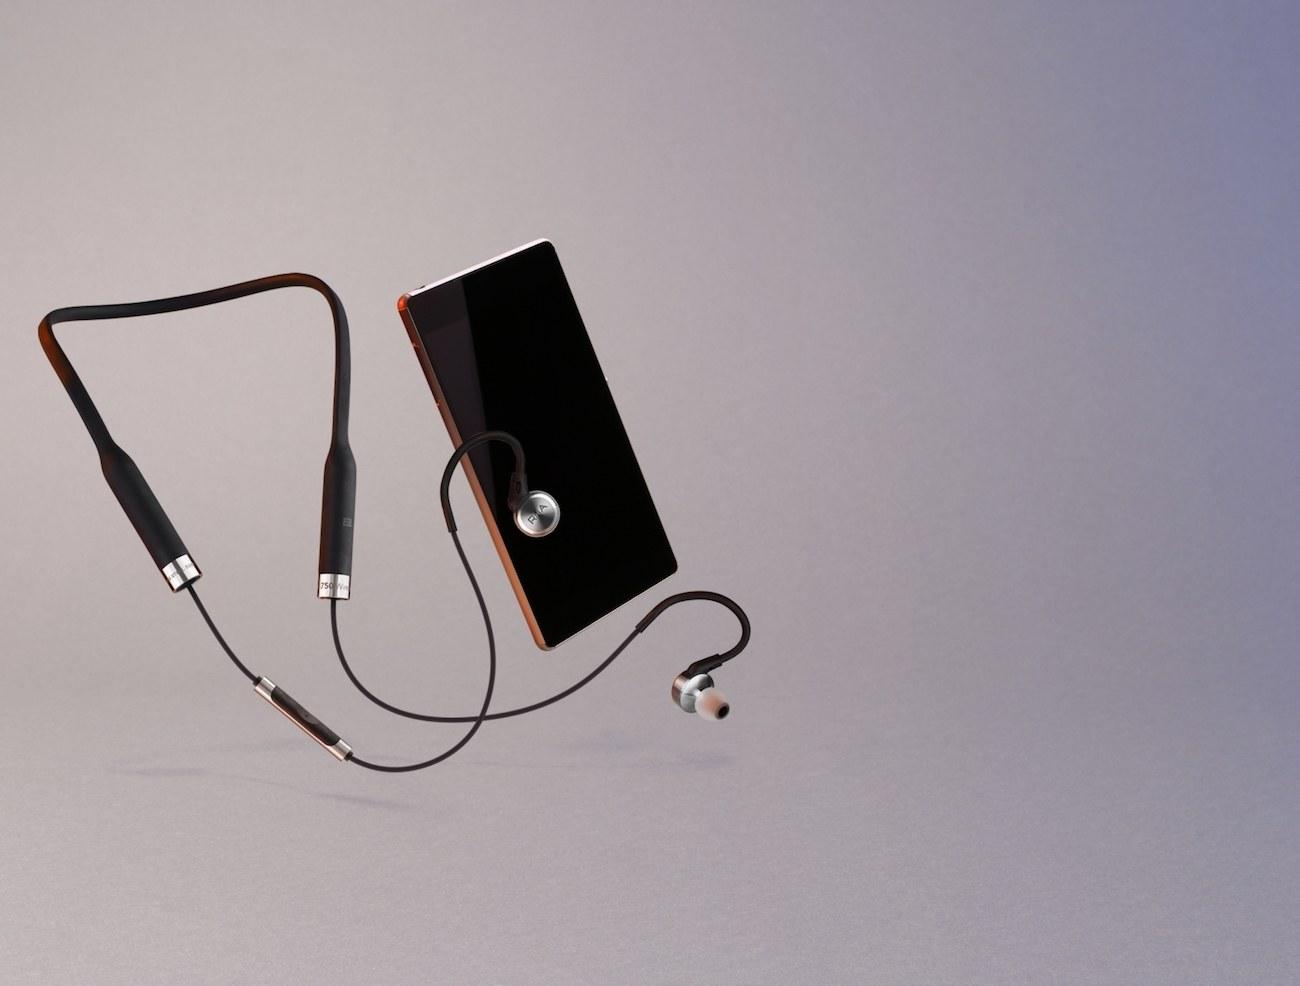 RHA MA750 Bluetooth Headphones